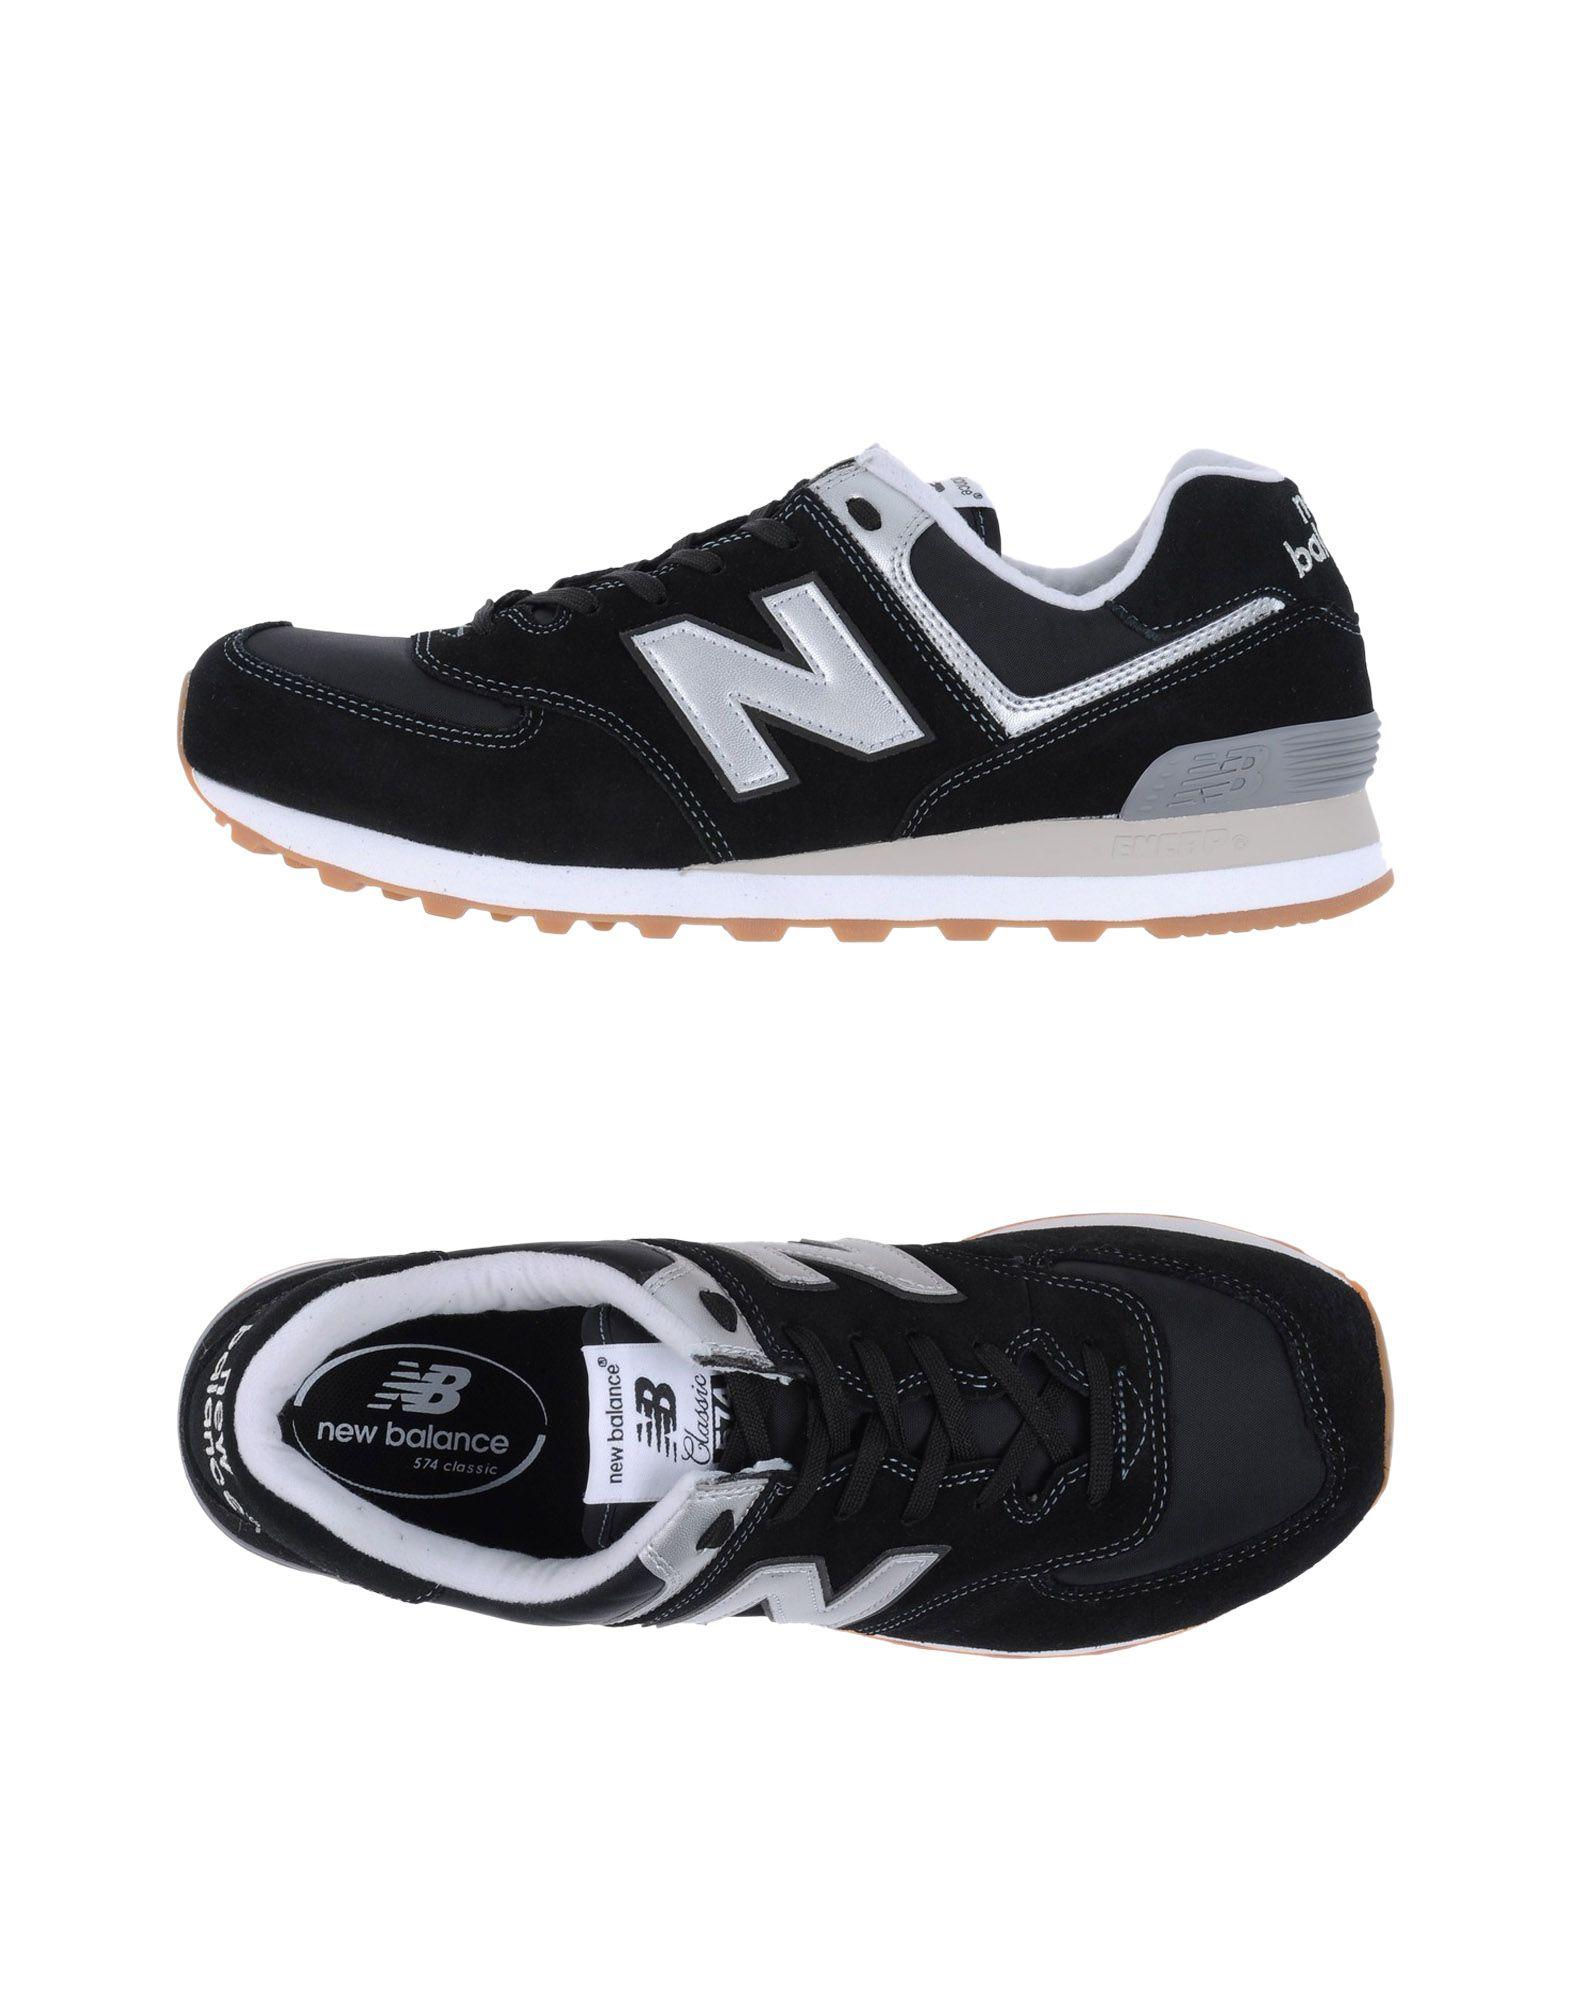 NEW BALANCE Herren Low Sneakers & Tennisschuhe Farbe Schwarz Größe 9